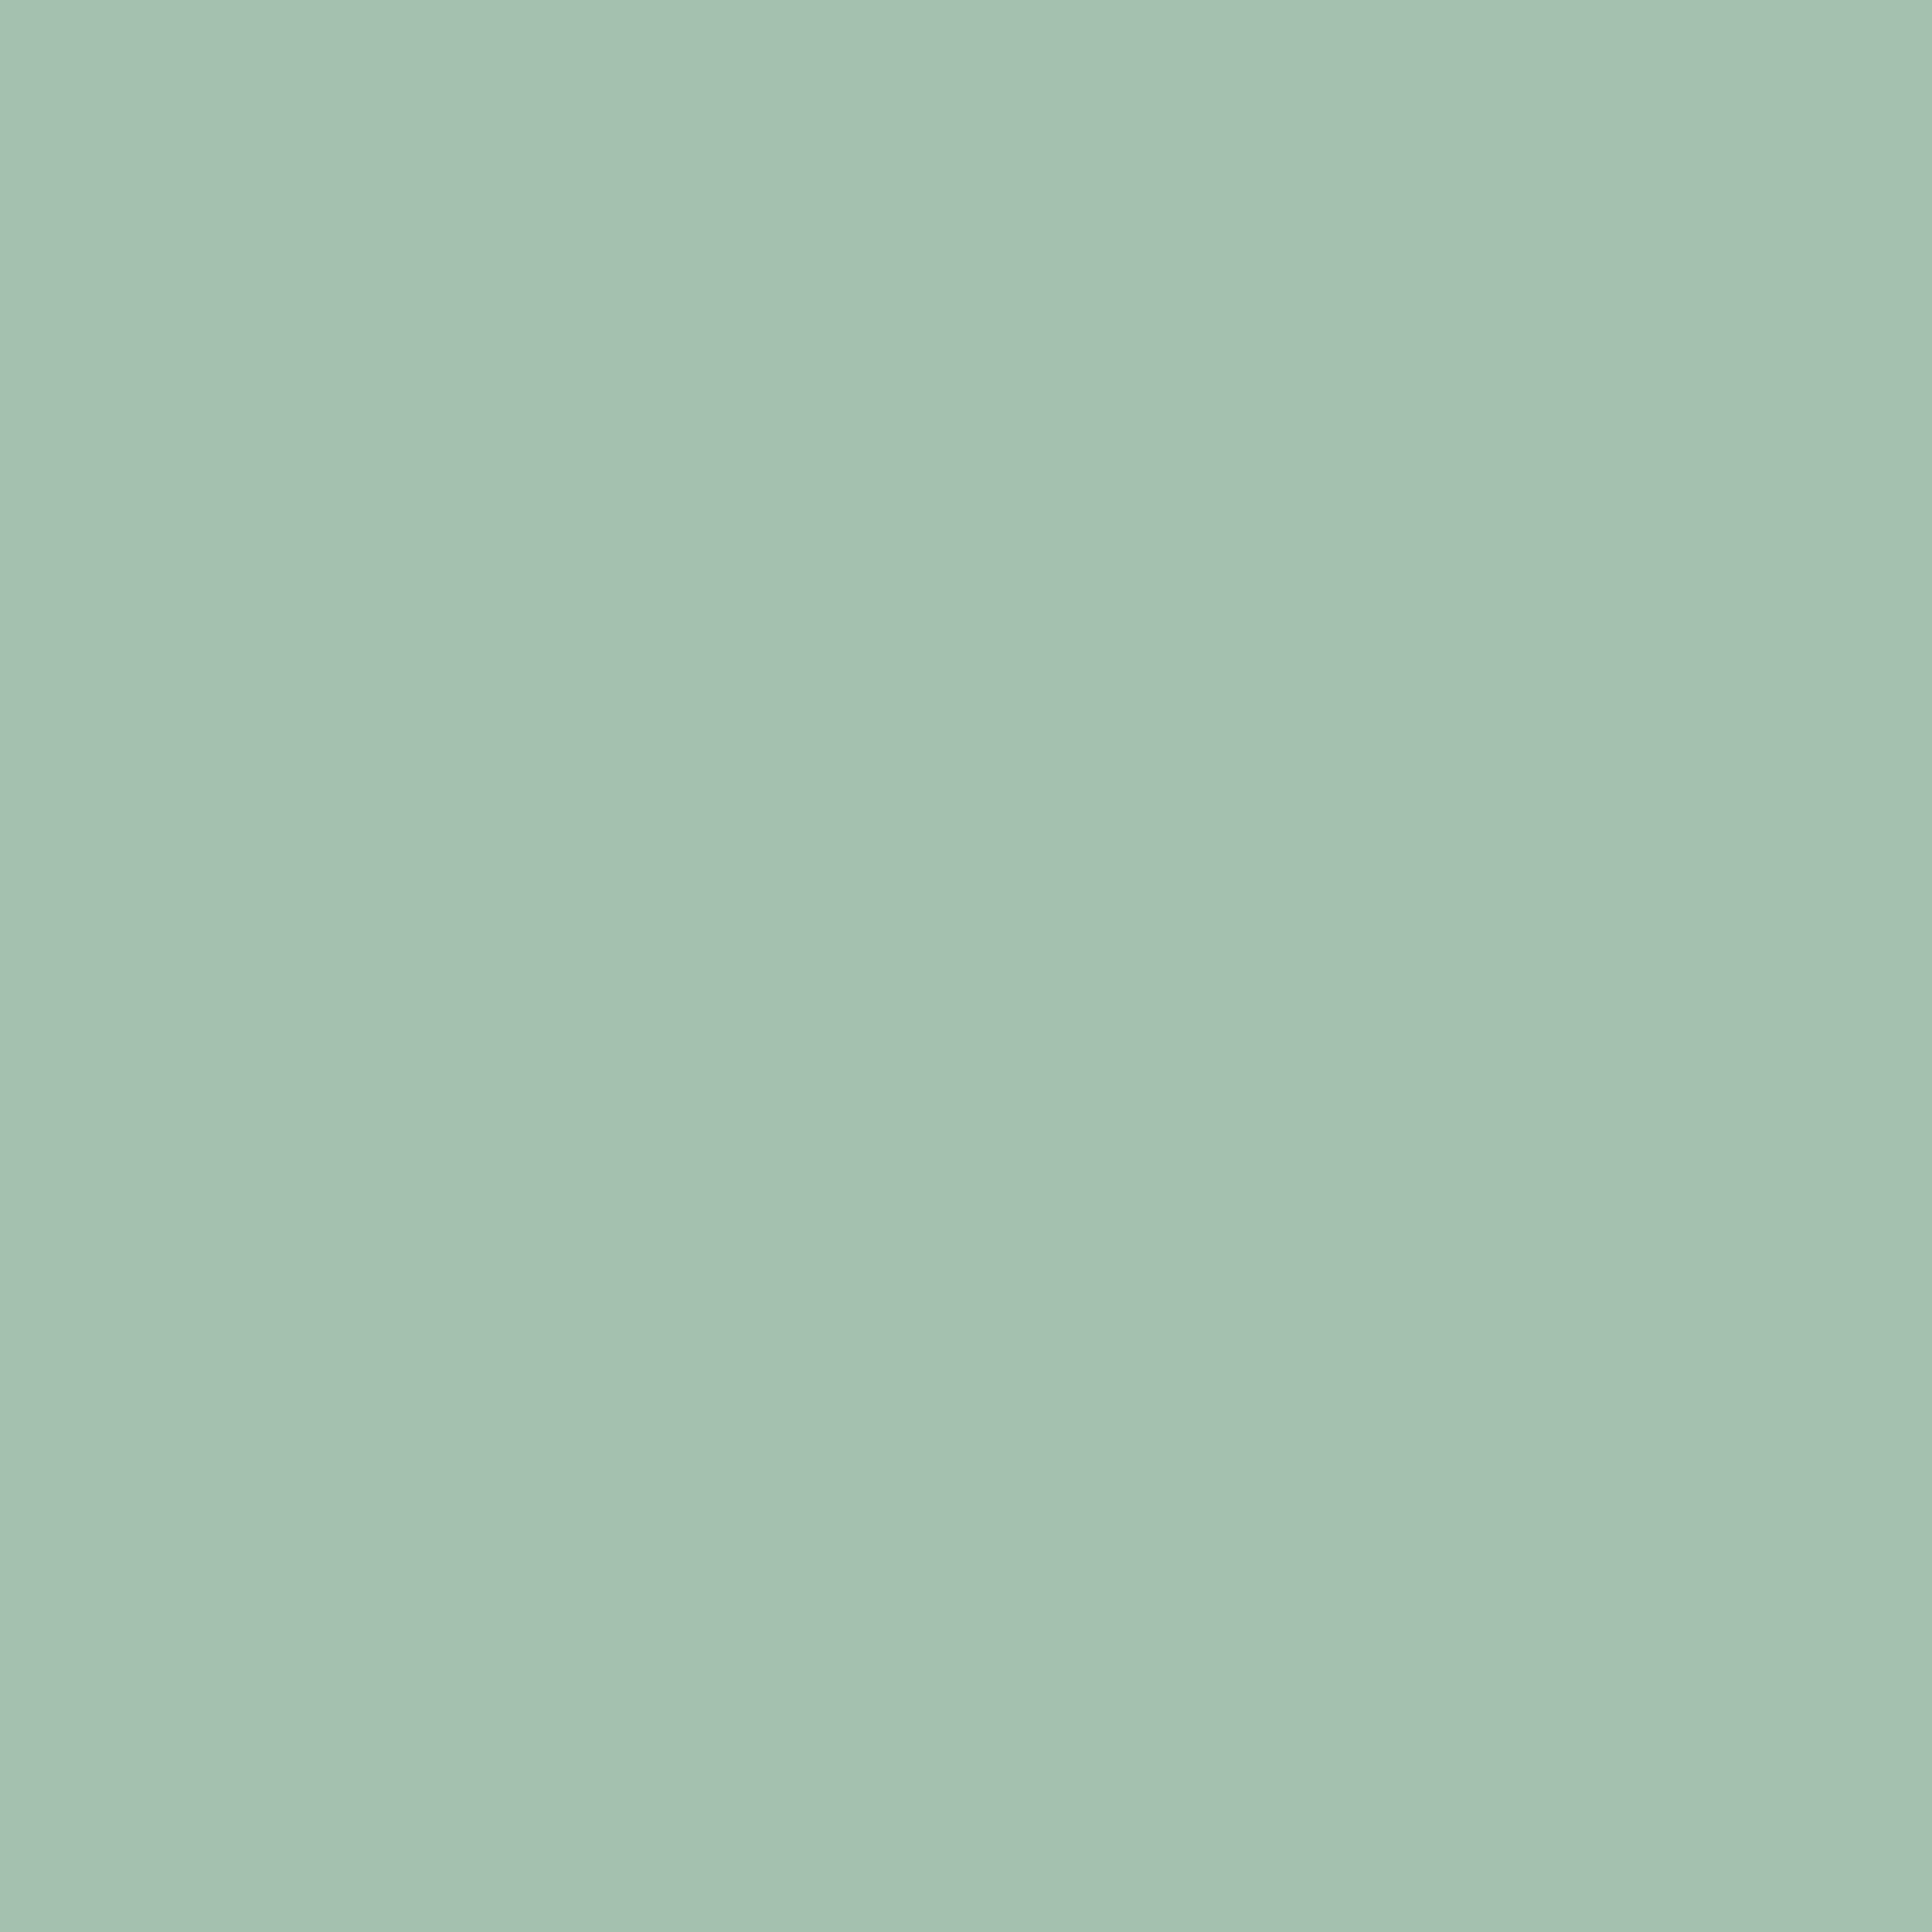 2048x2048 Cambridge Blue Solid Color Background